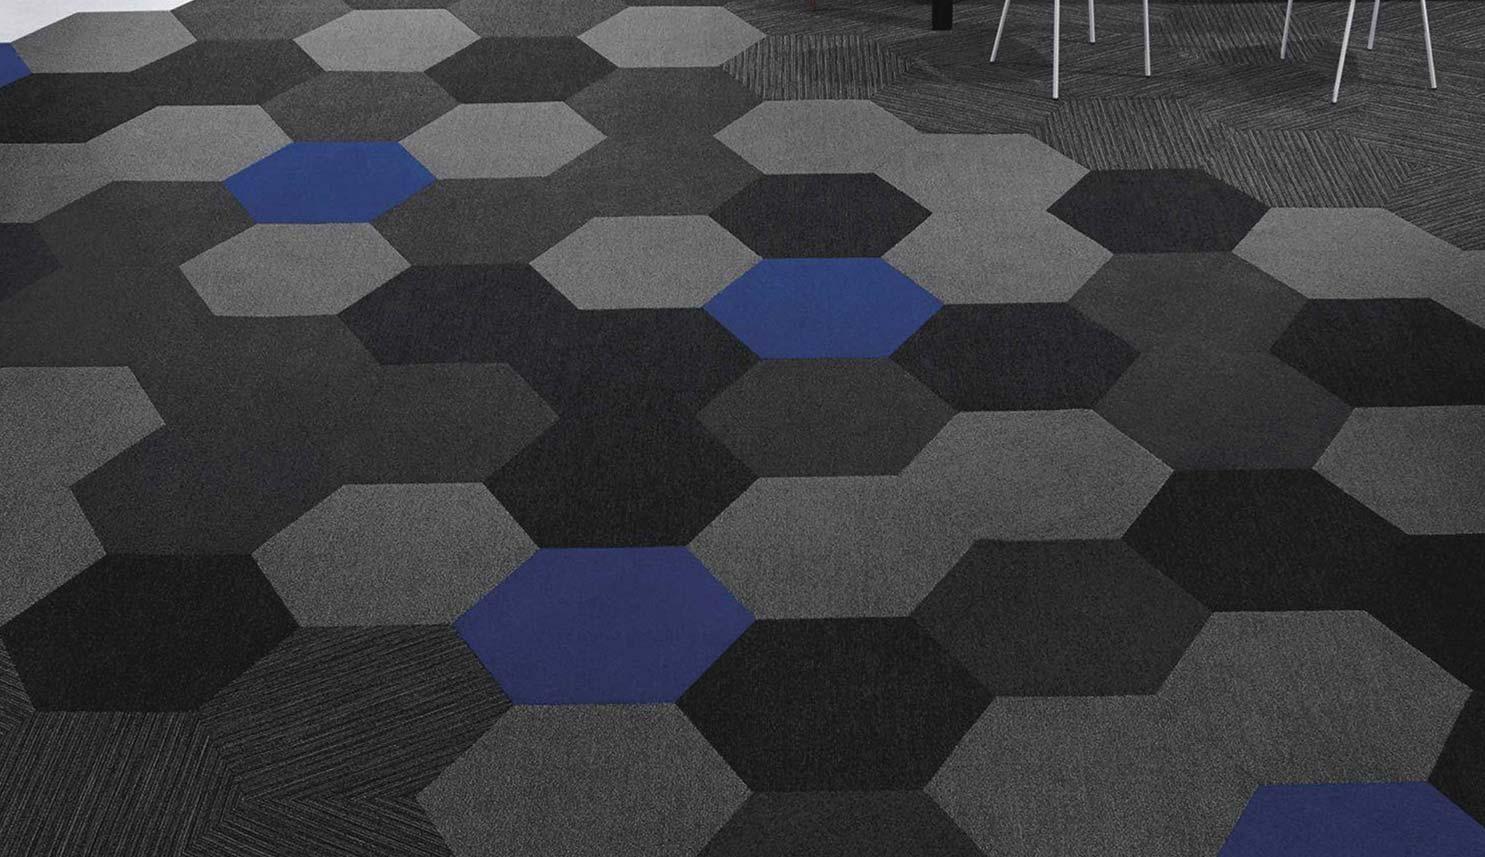 Plane-Hexagon-roomshot